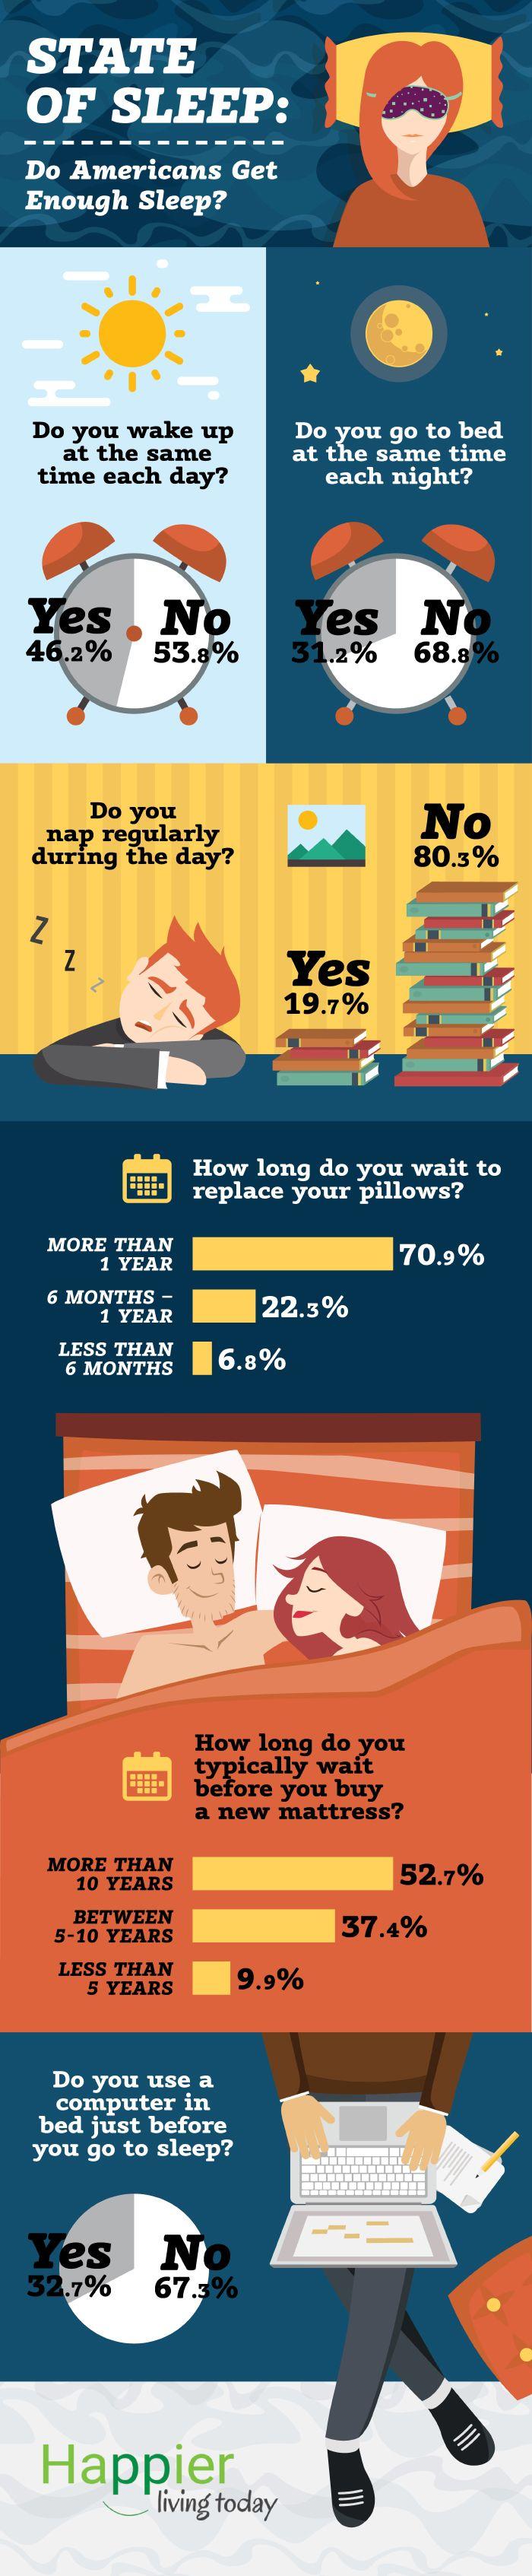 State of Sleep: Do Americans Get Enough Sleep? Infographics #sleep #sleeping #surveys #statistics #americans #infografia #infographic #wakeup #pillow #mattress